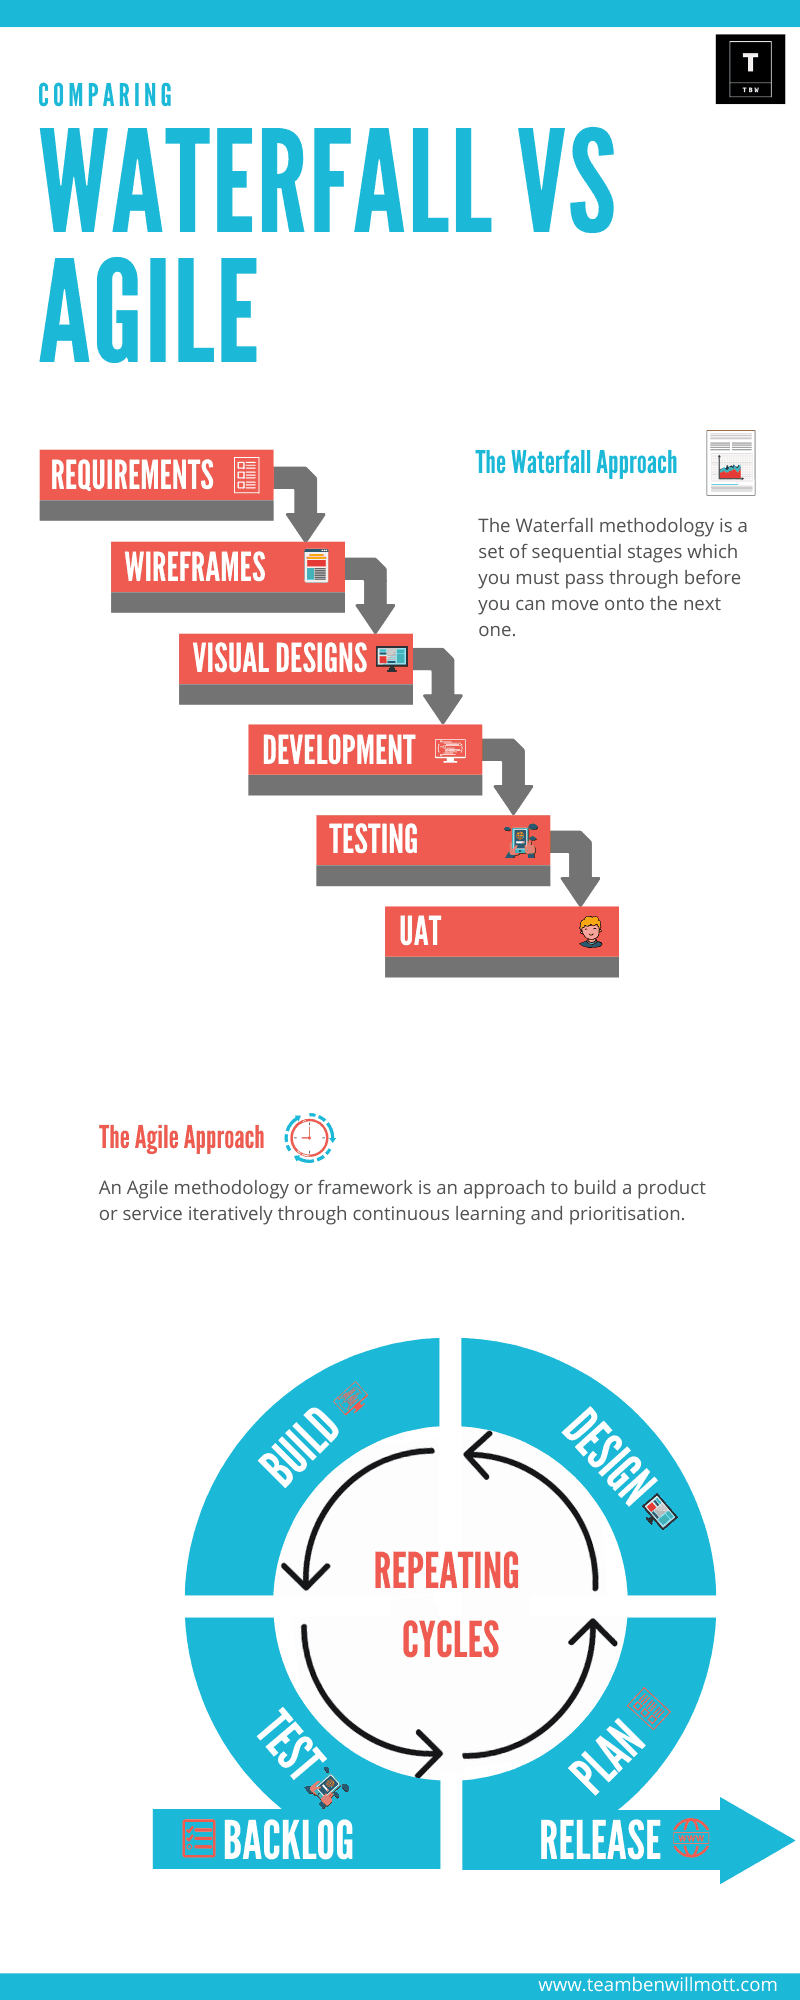 Waterfall vs agile_info.png